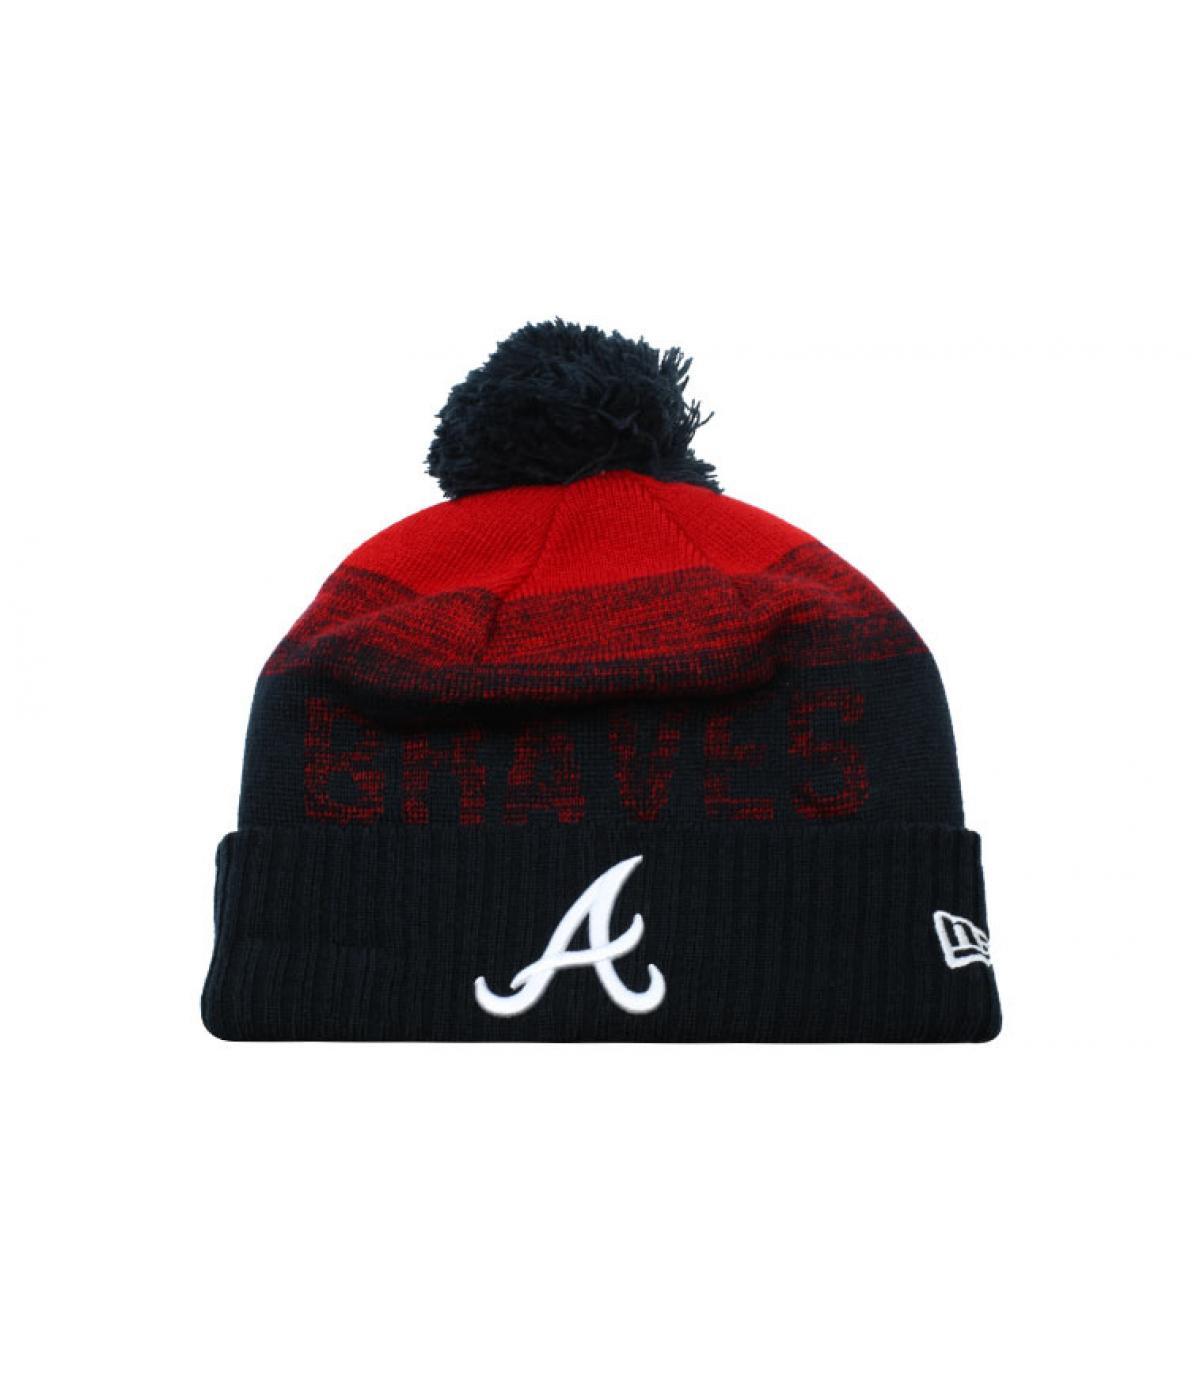 Details MLB Sport Knit Atlanta - afbeeling 2